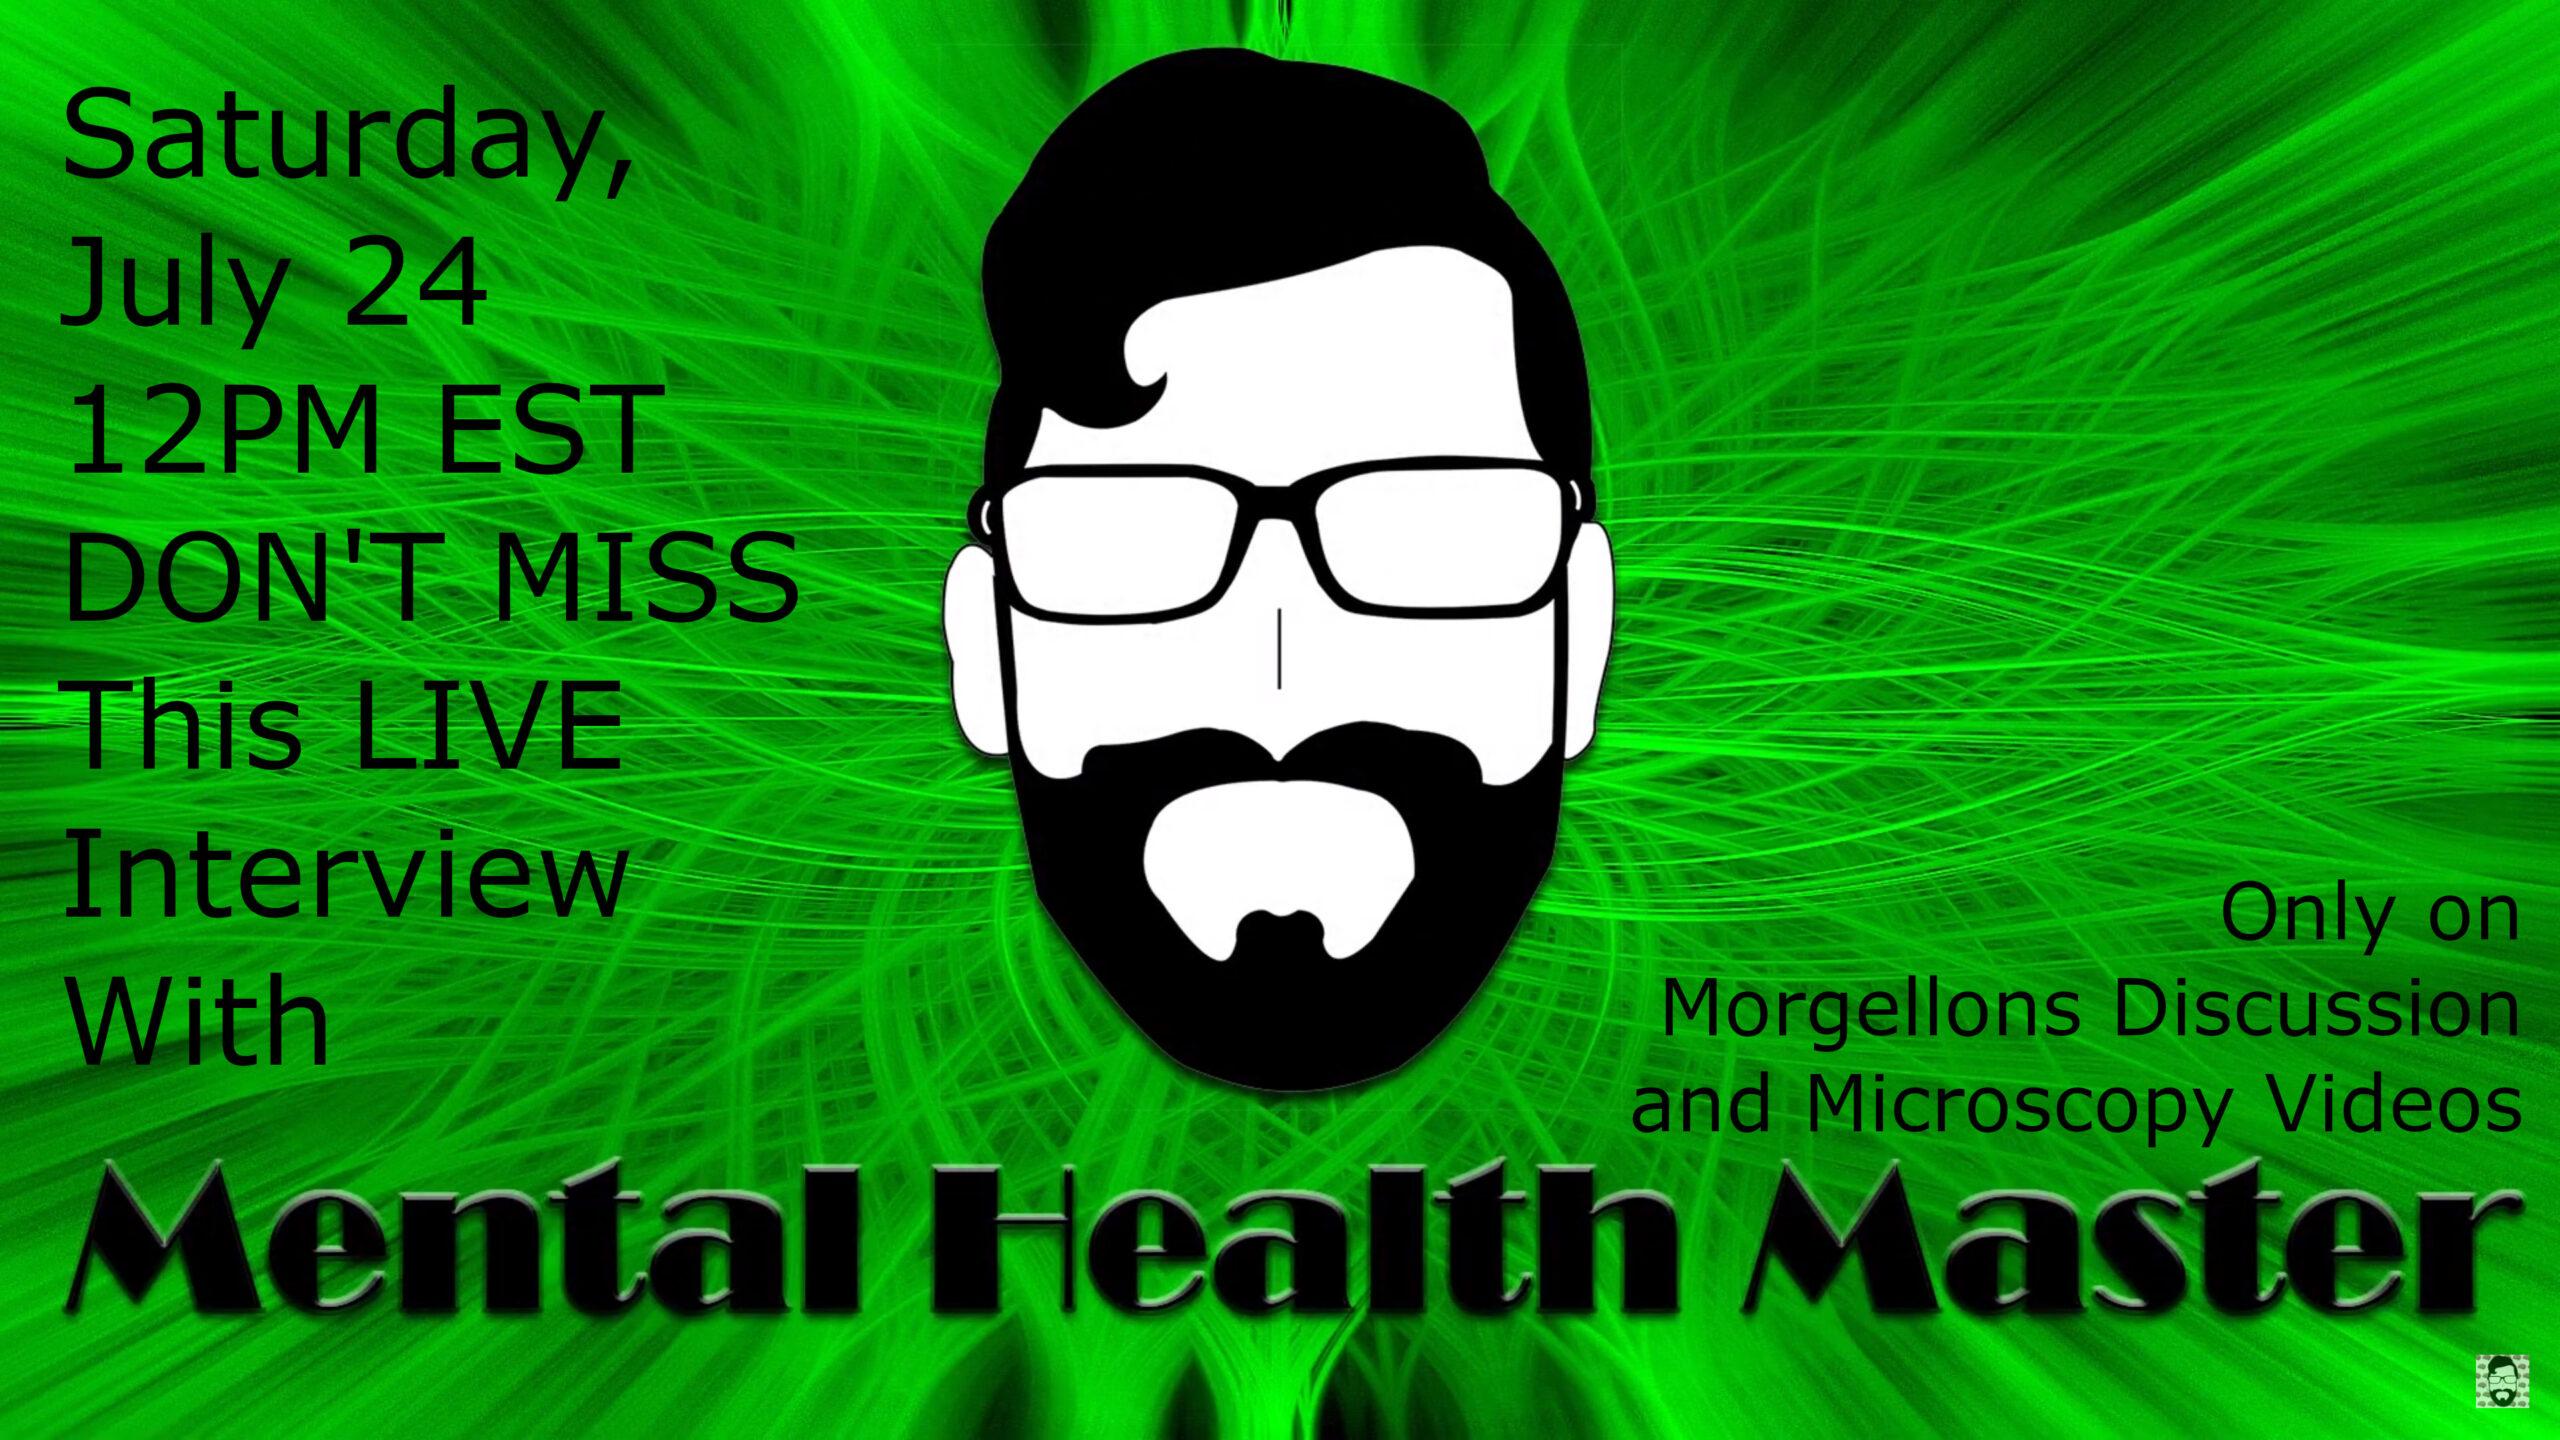 Mental Health Master